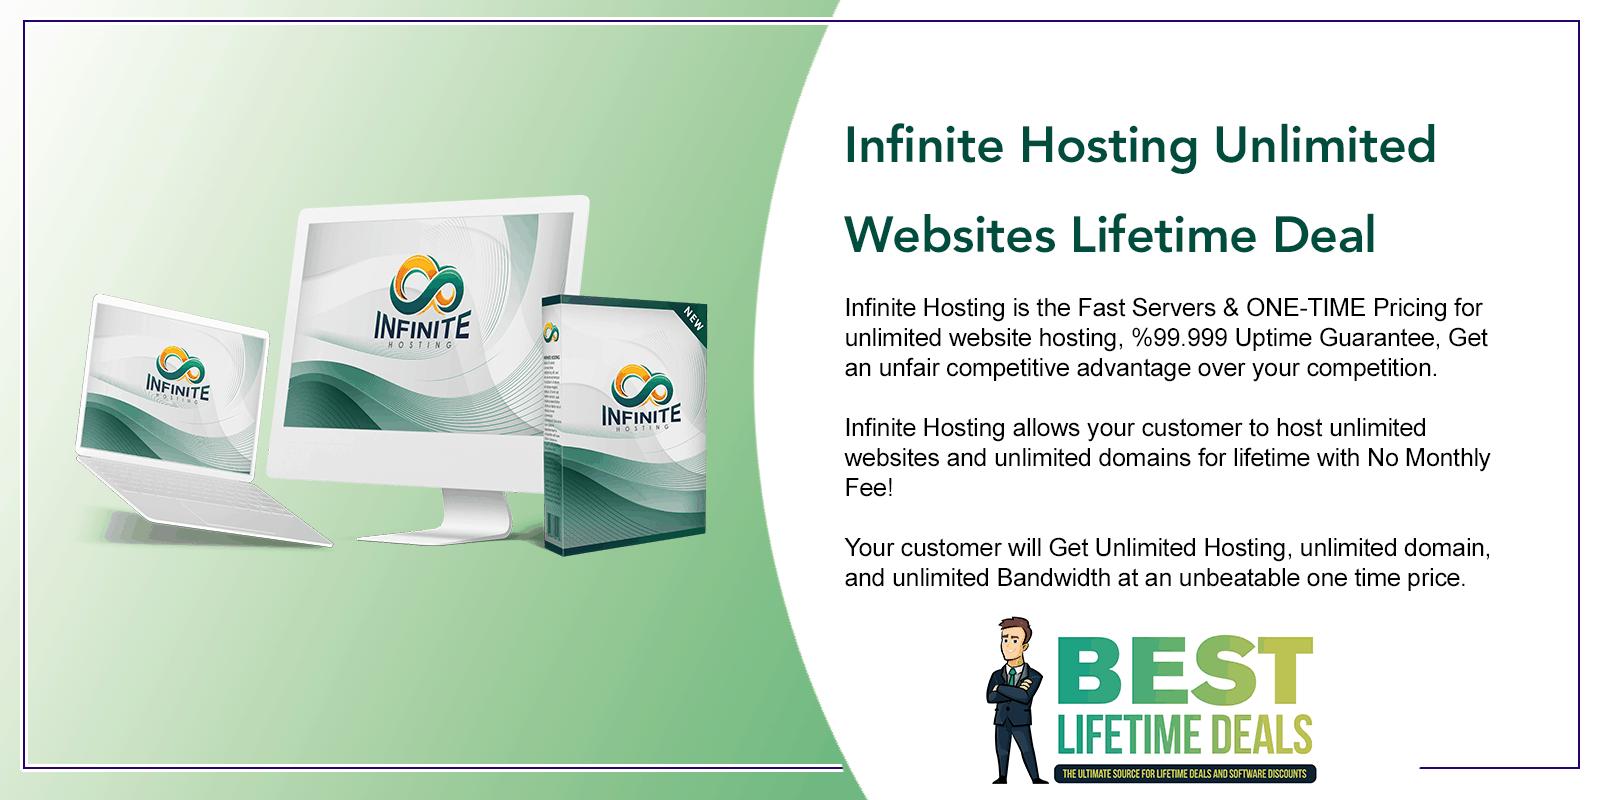 Infinite Hosting Unlimited